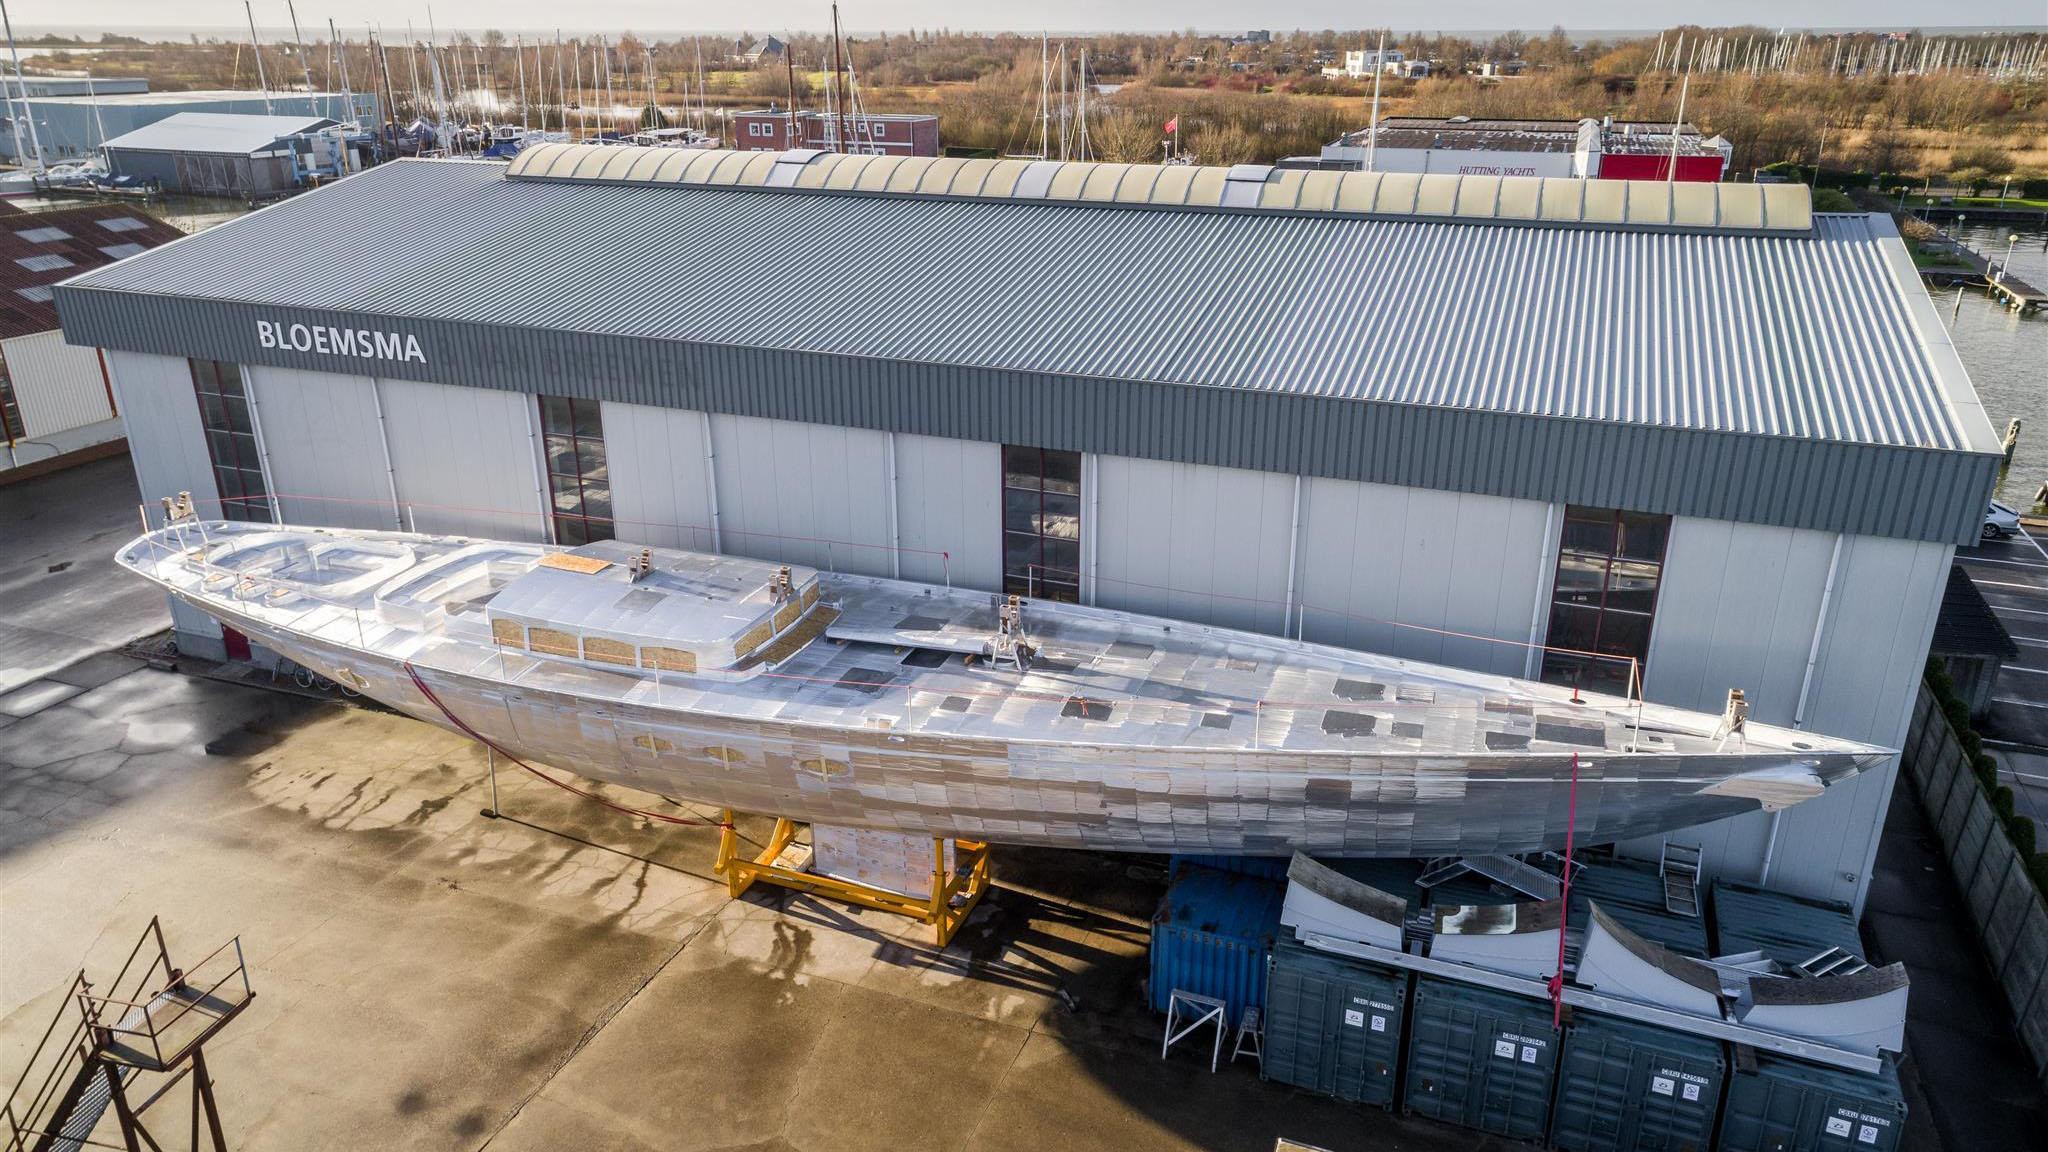 tc 128 sailing yachts ses yachts 39m 2019 under construction aerial